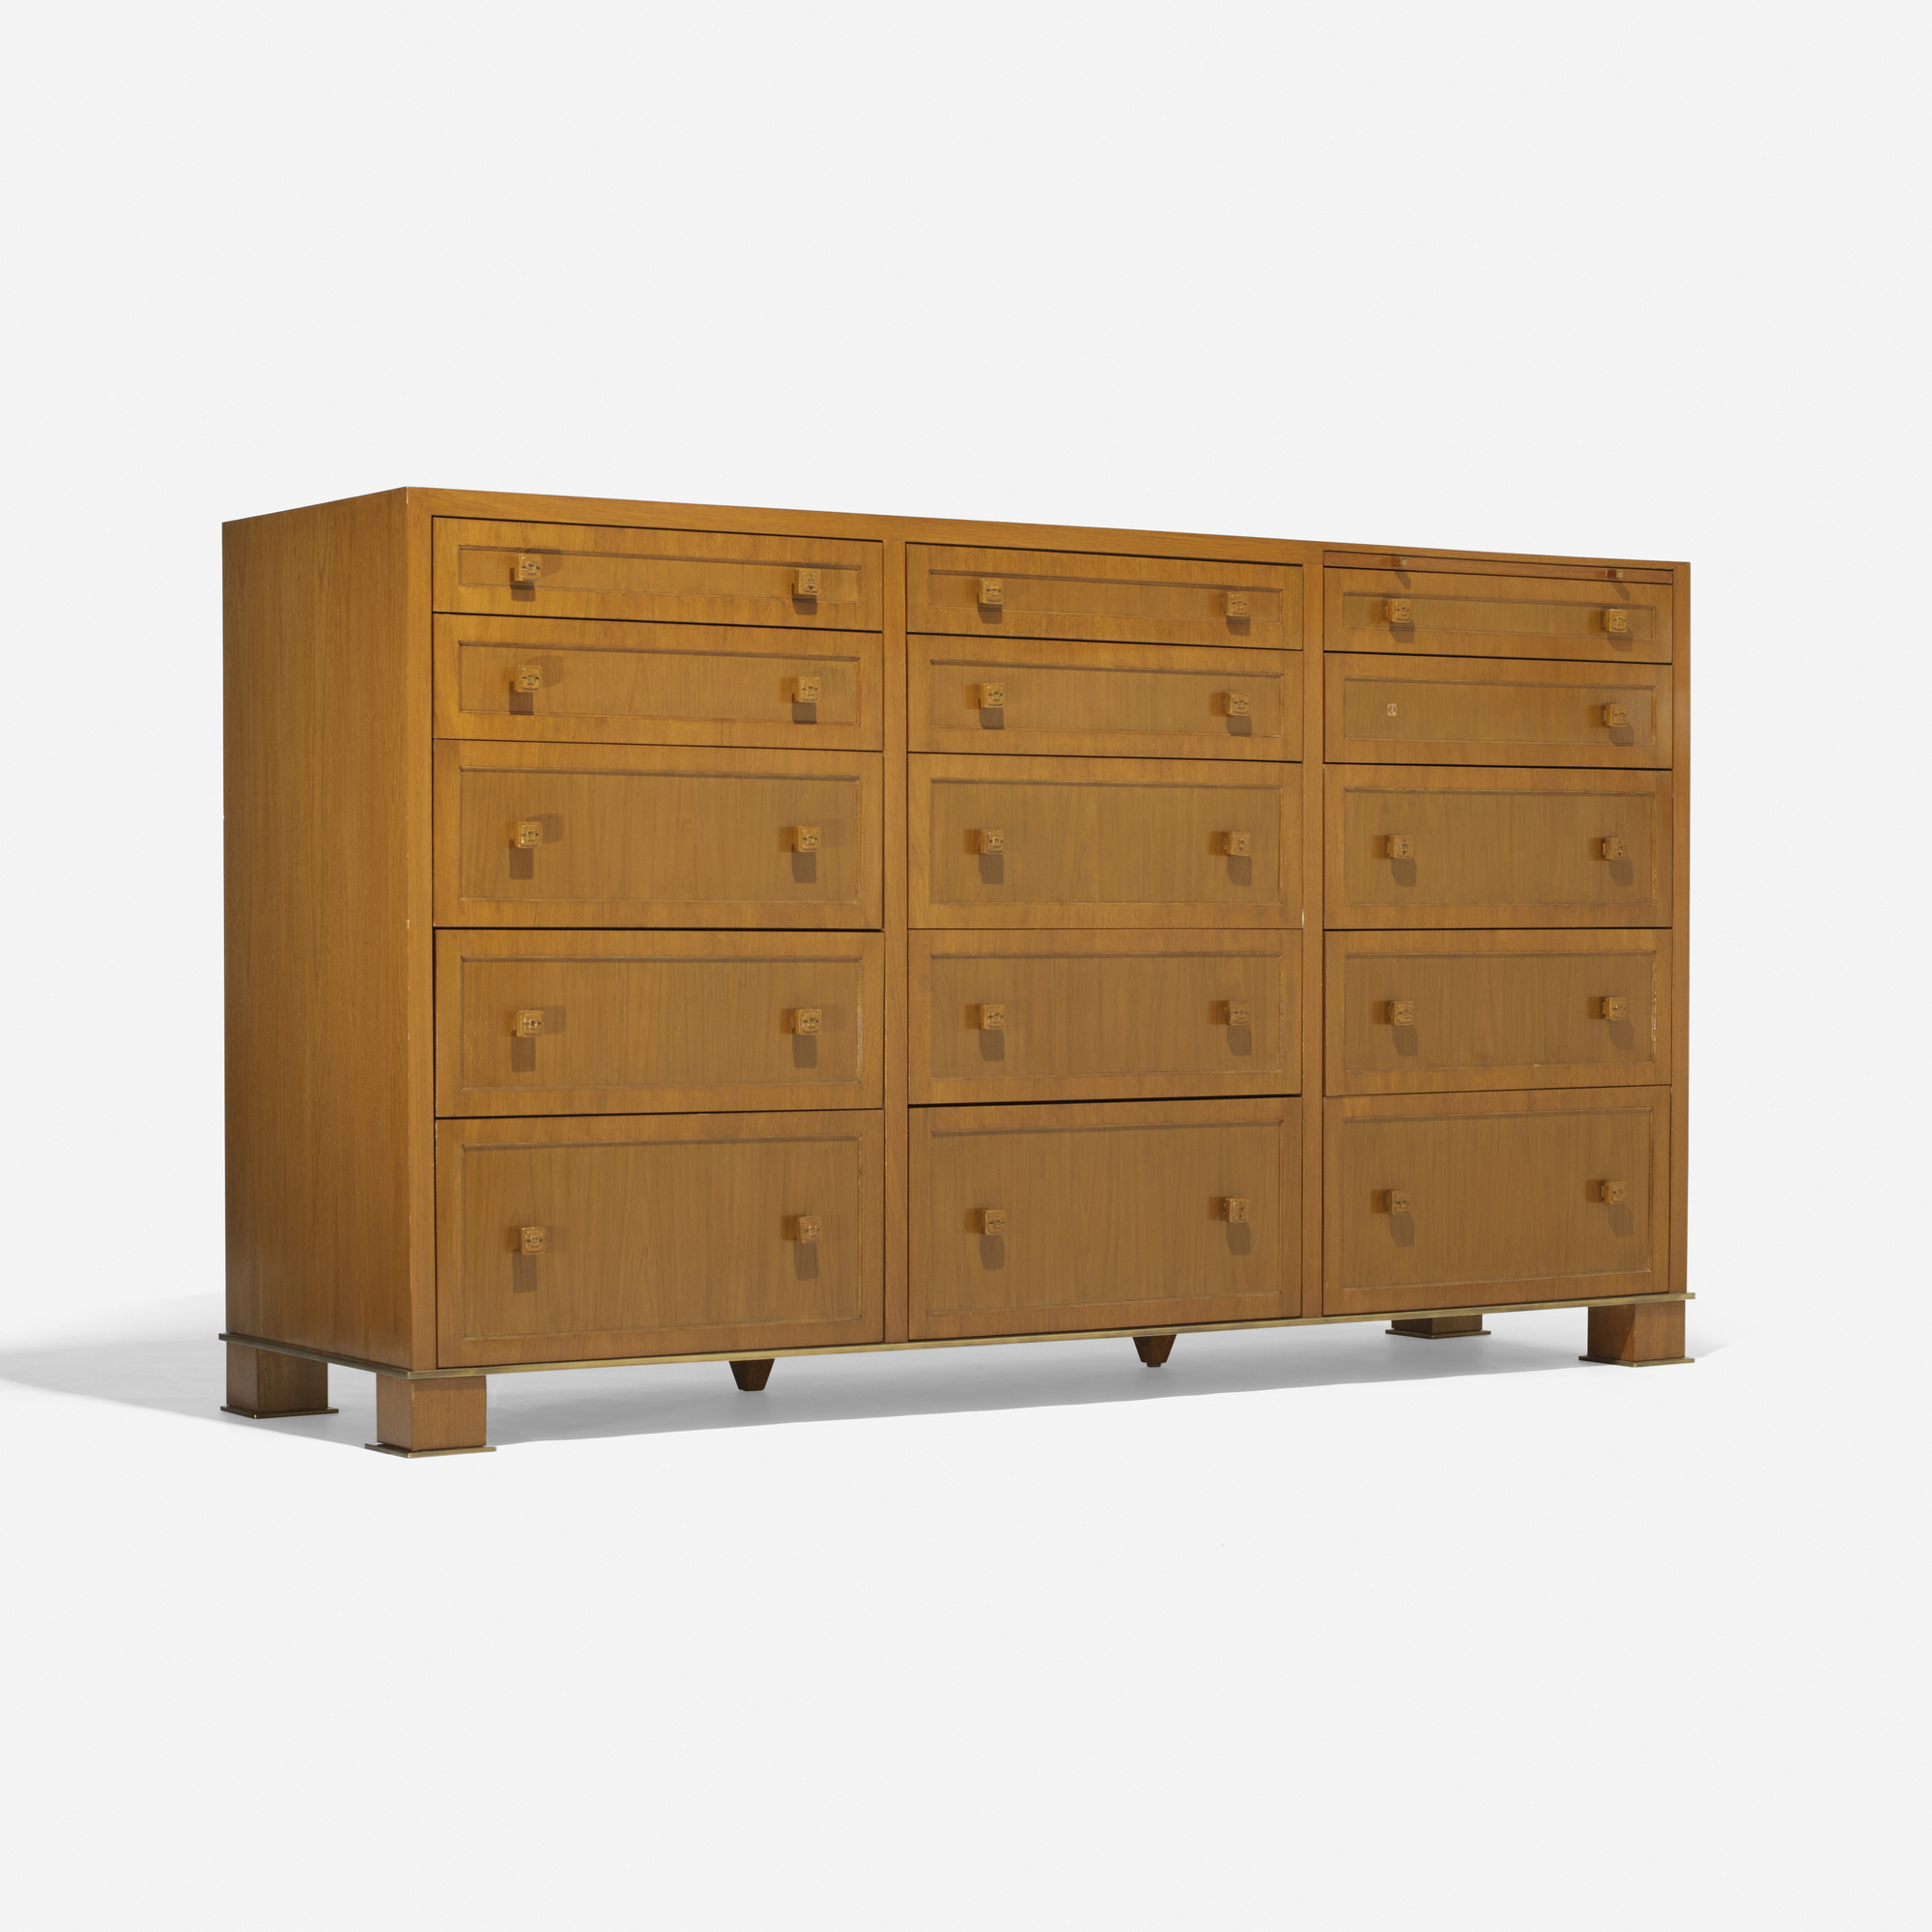 218: Art Deco / cabinet (1 of 3)